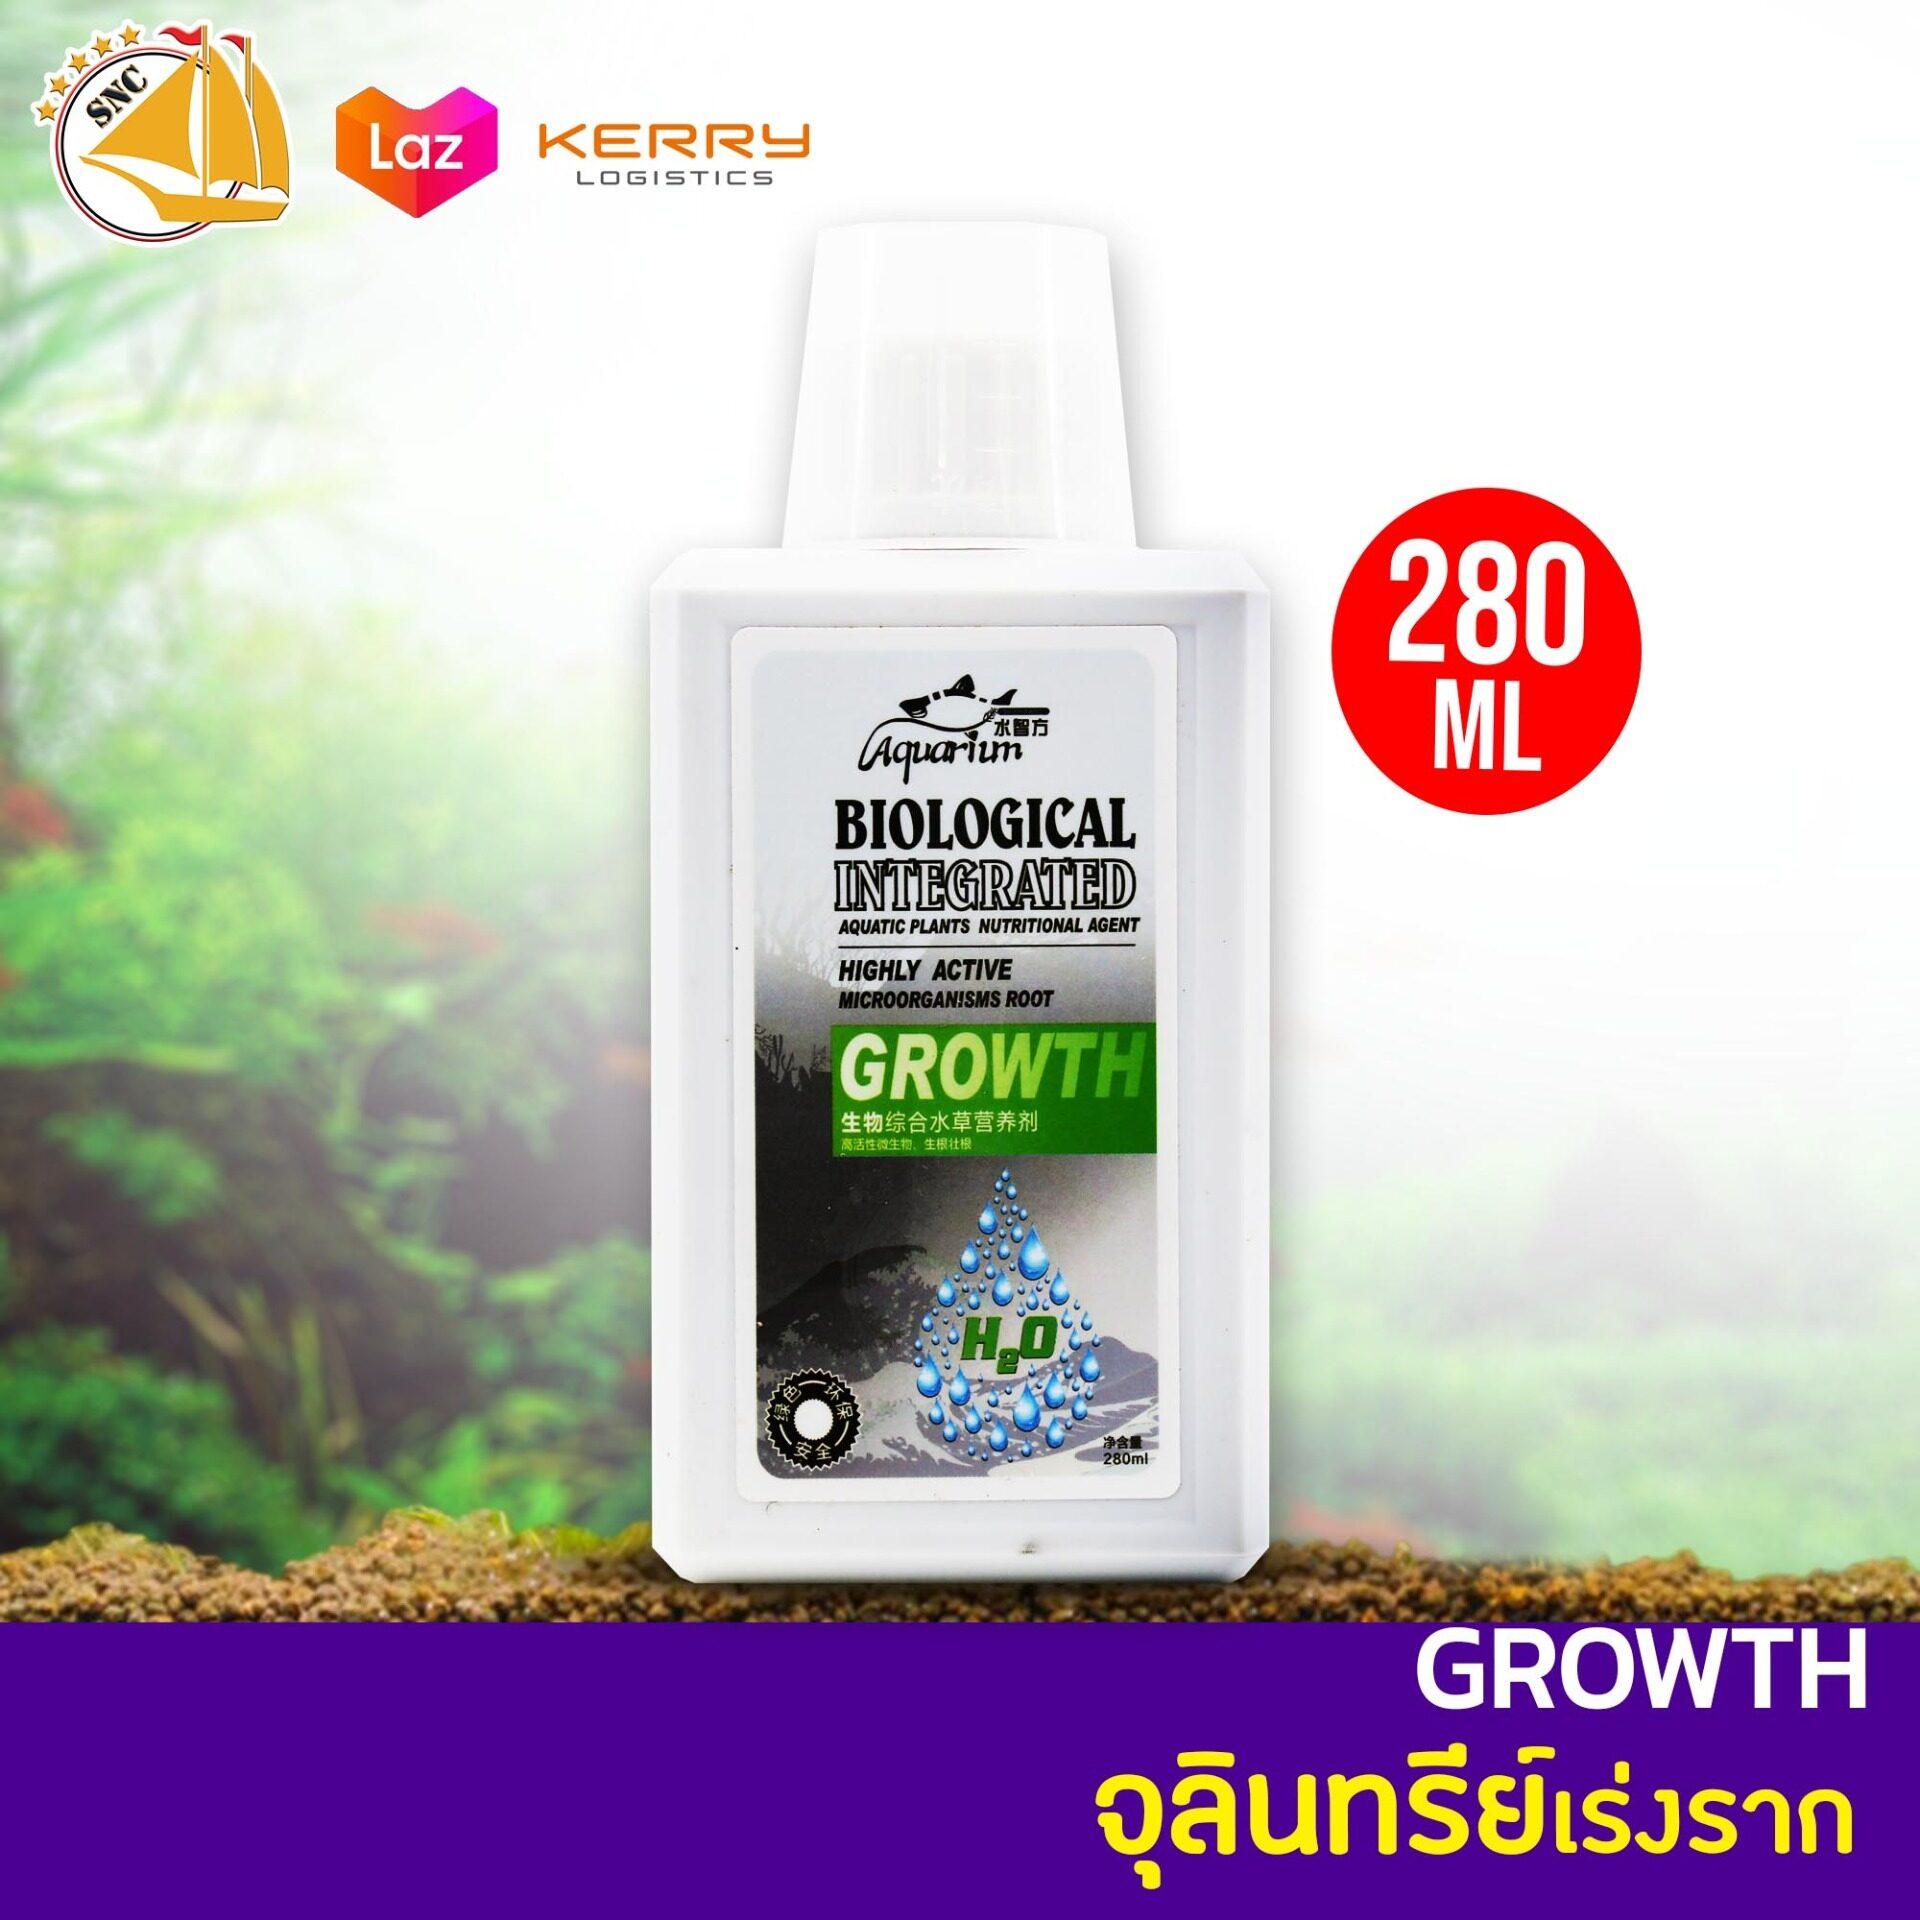 BIOLOGICAL Aquarium Growth จุลินทรีย์เร่งราก เสริมการเจิรญเติบโตของราก บรรจุ 280 ml